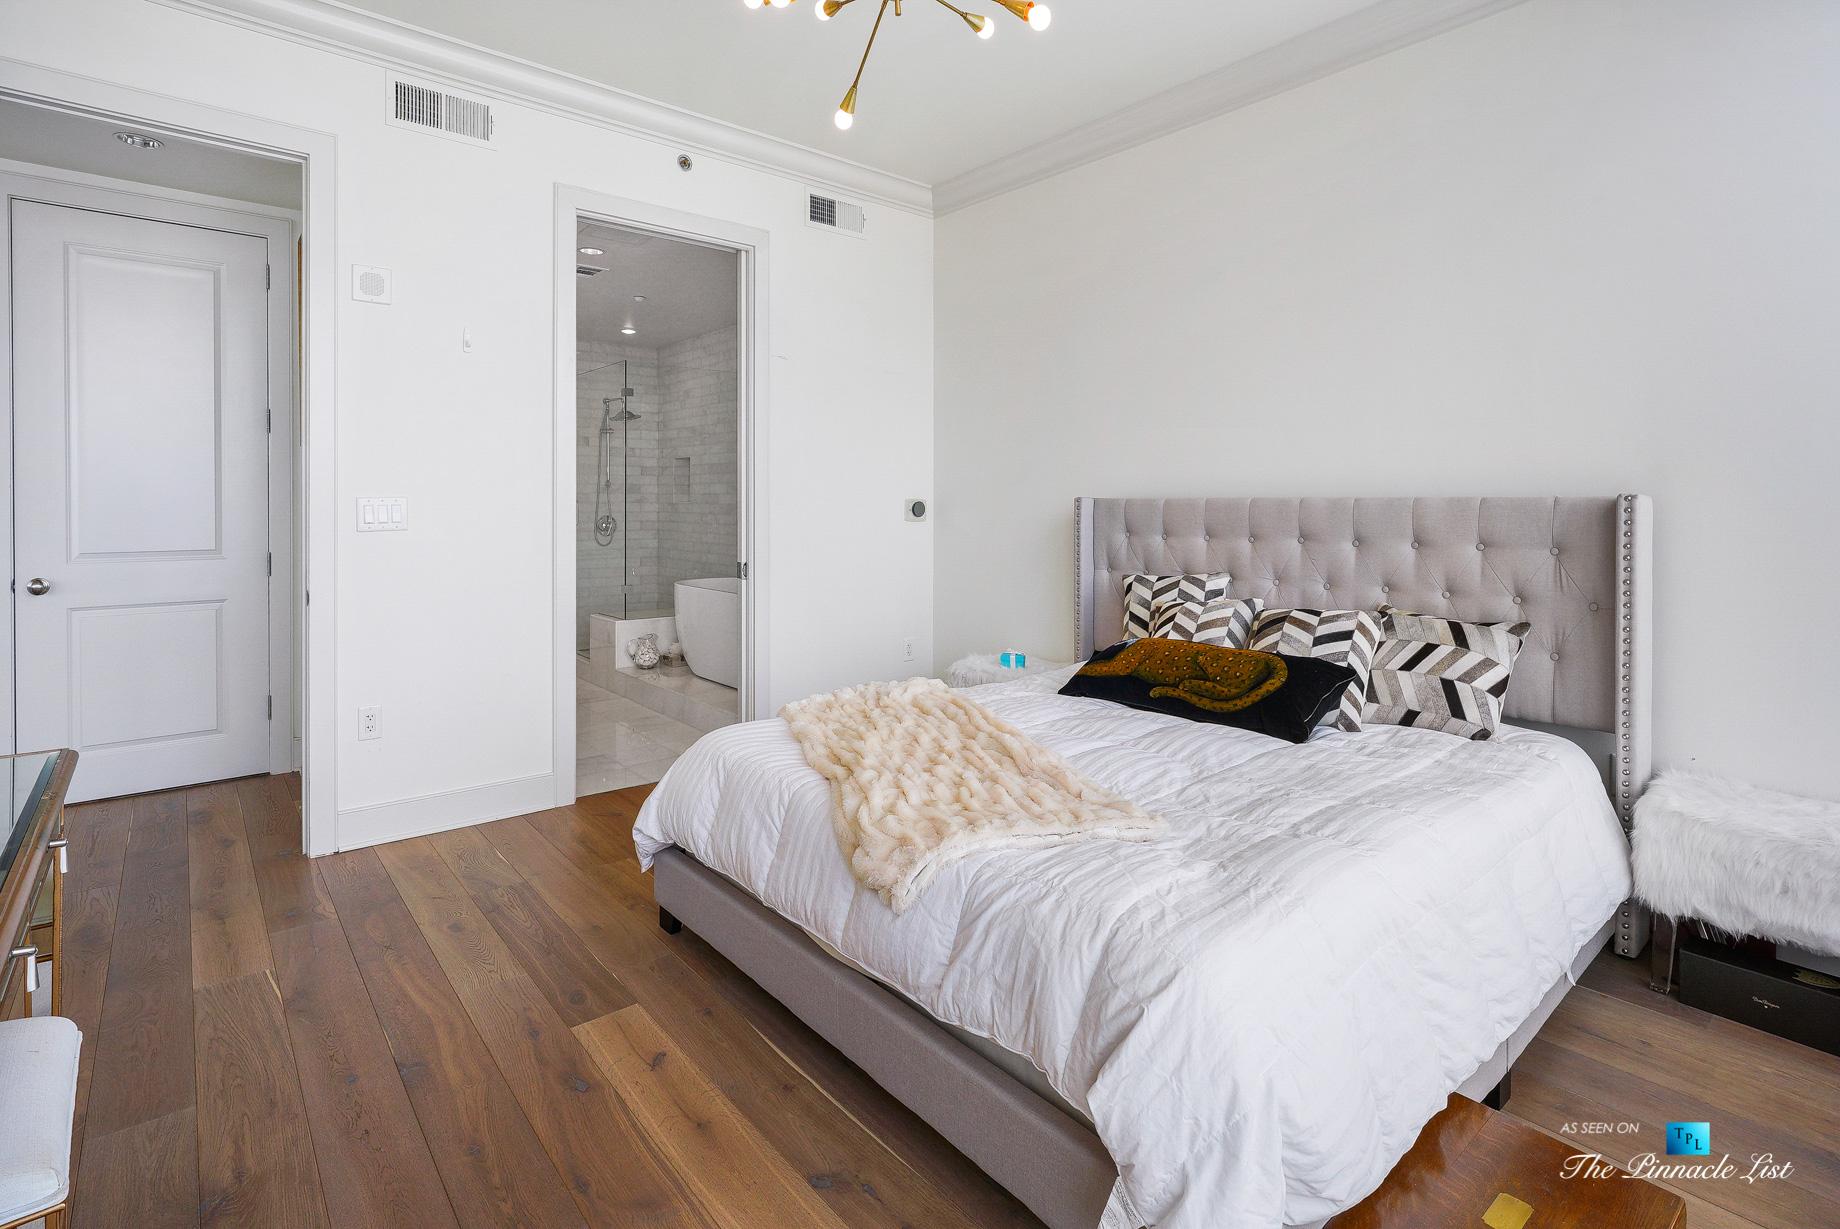 3630 Peachtree Rd NE, Unit 2307, Atlanta, GA, USA – Apartment Master Bedroom – Luxury Real Estate – Ritz-Carlton Residences Buckhead